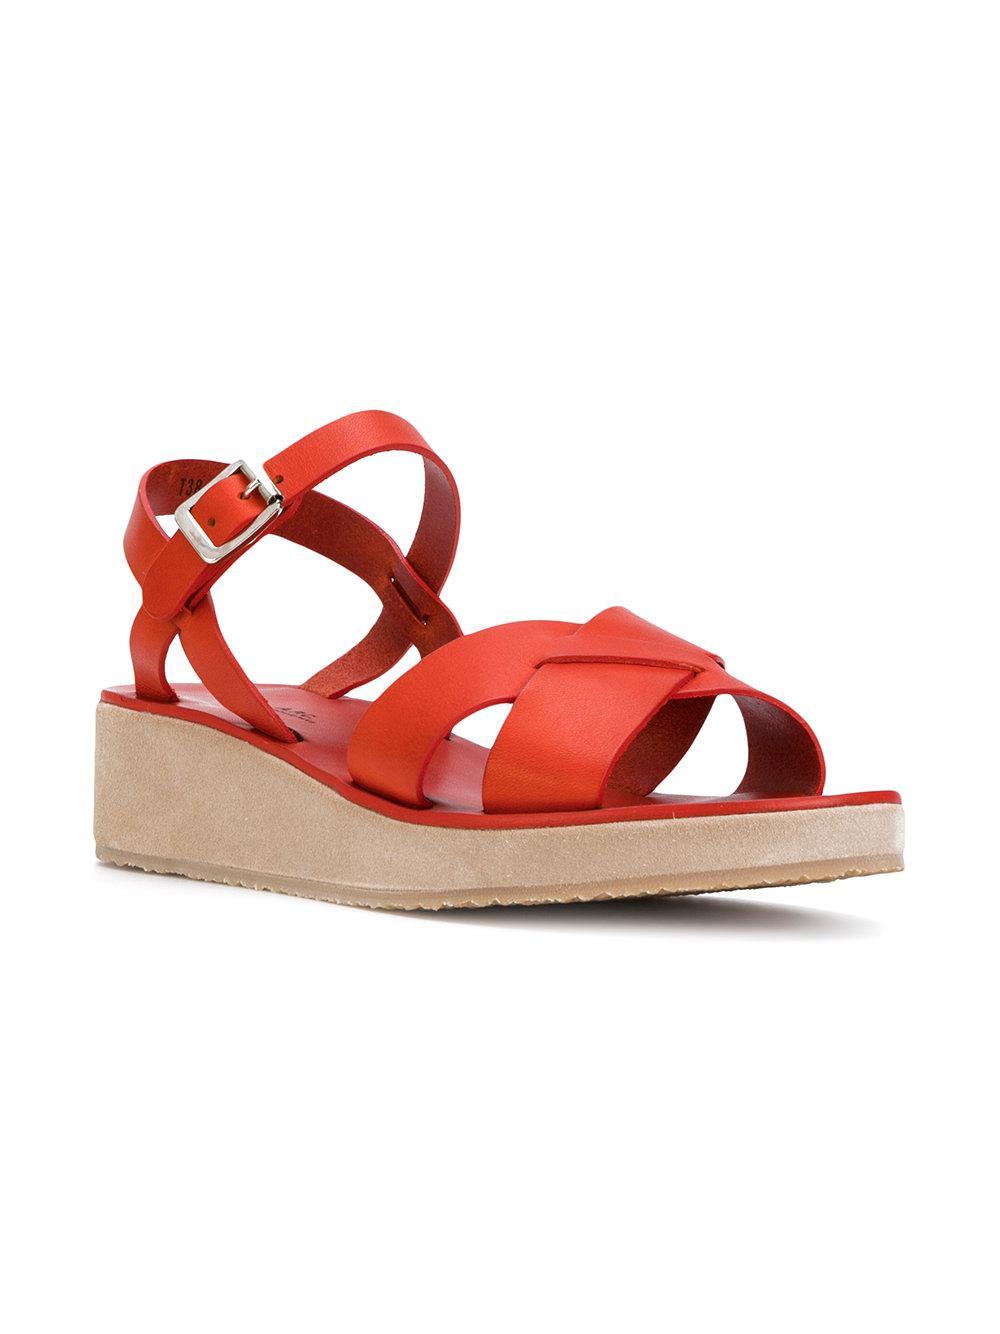 A.P.C. Orange Suede Carmin Sandals t333OQ